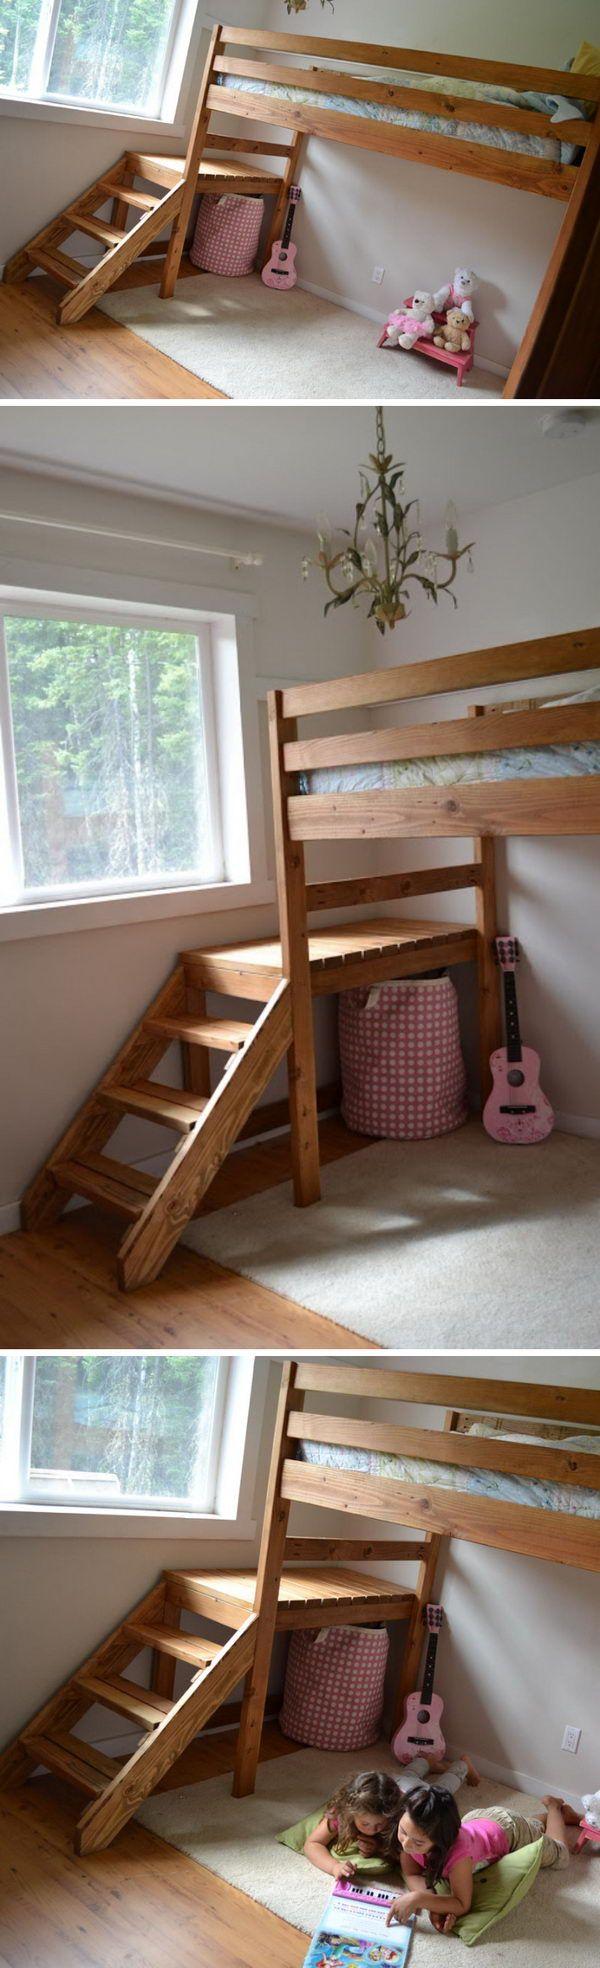 Cool DIY Kids Bunk Bed Ideas and Tutorials Girls bunk